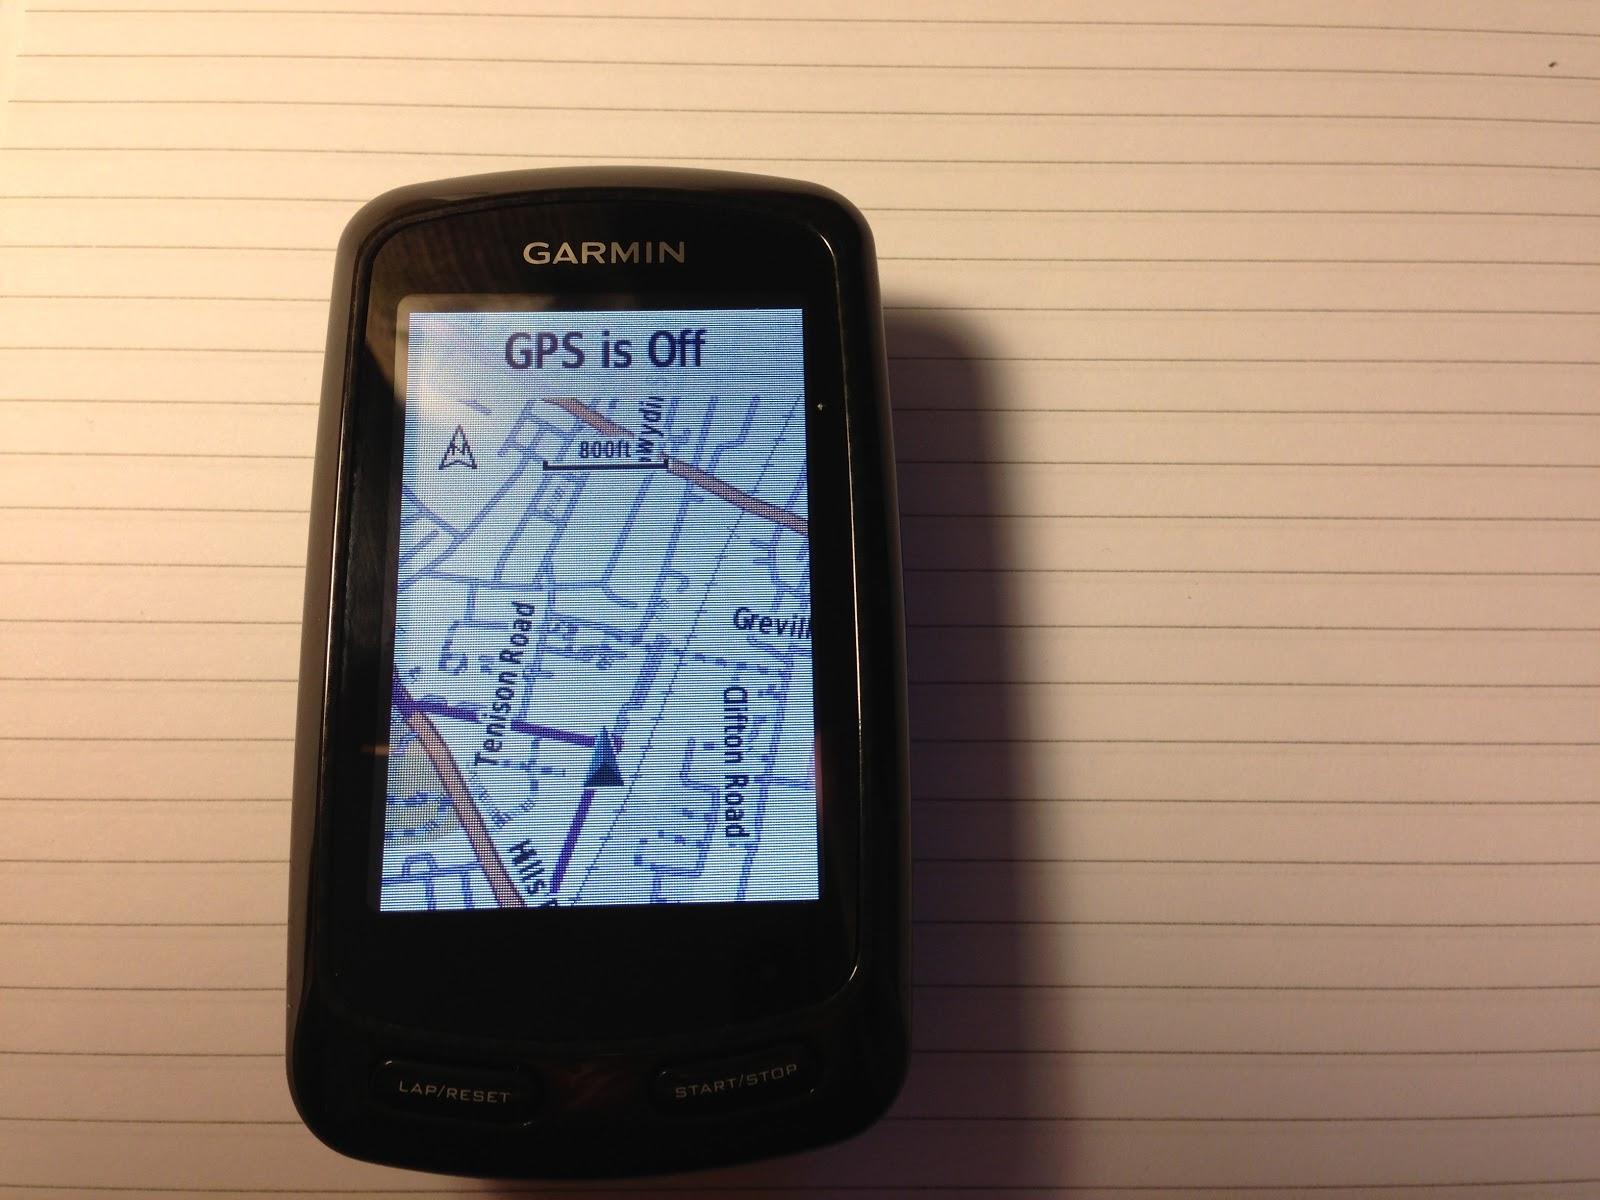 Test: Garmin our site